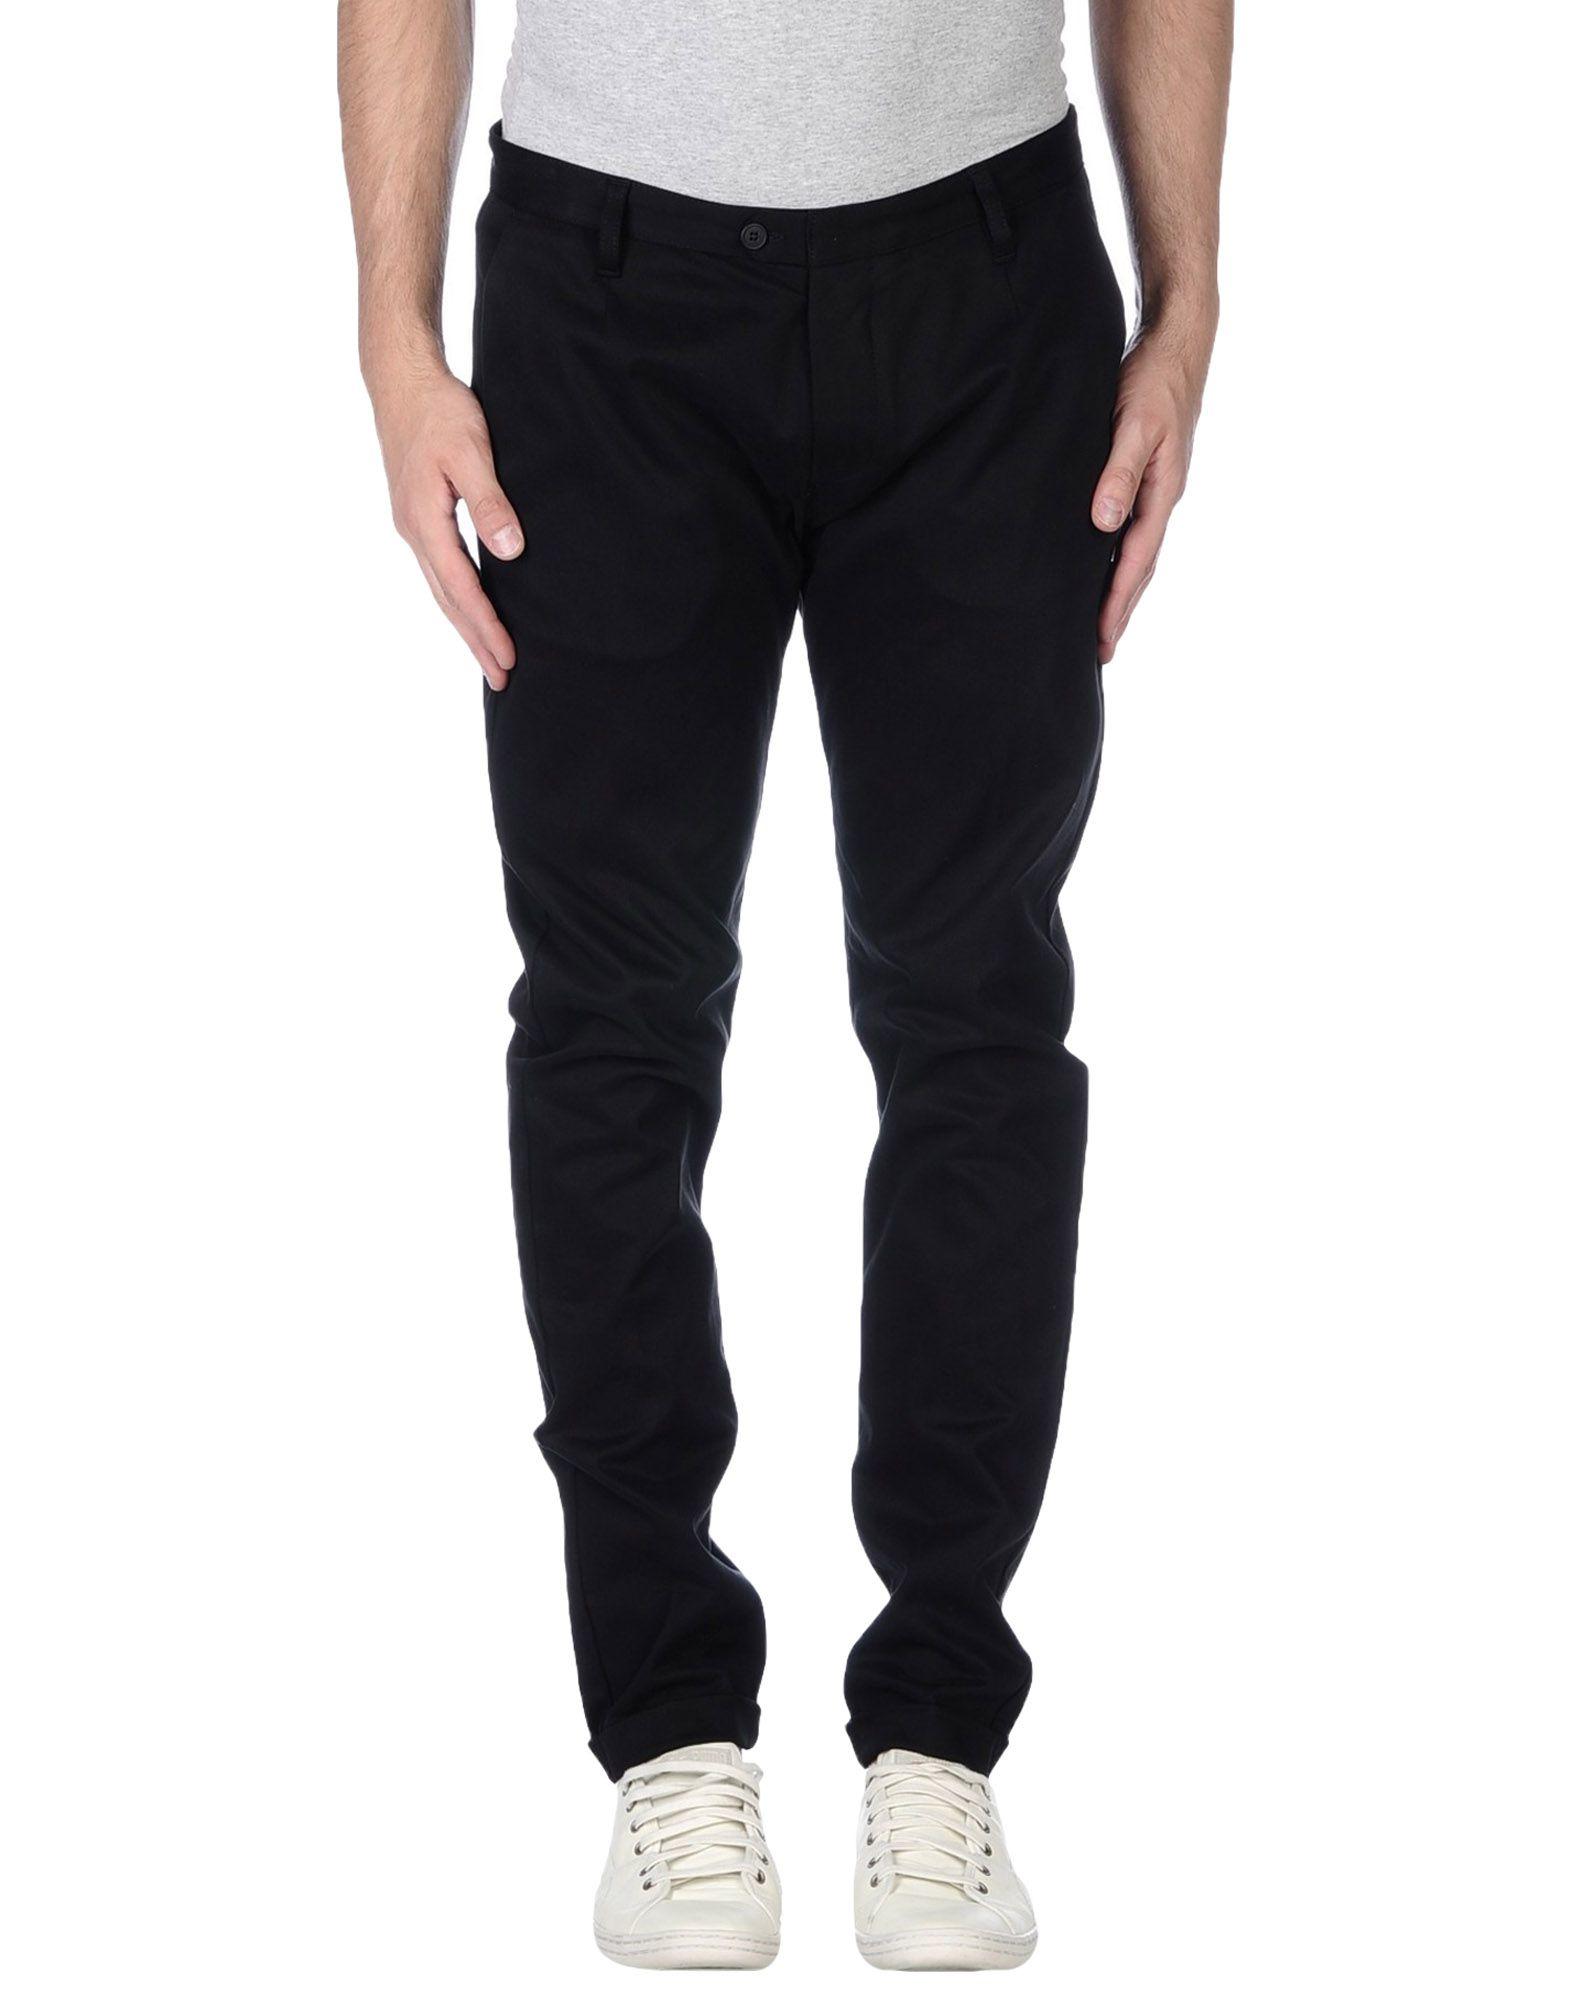 Officina 36 Casual Trouser in Black for Men